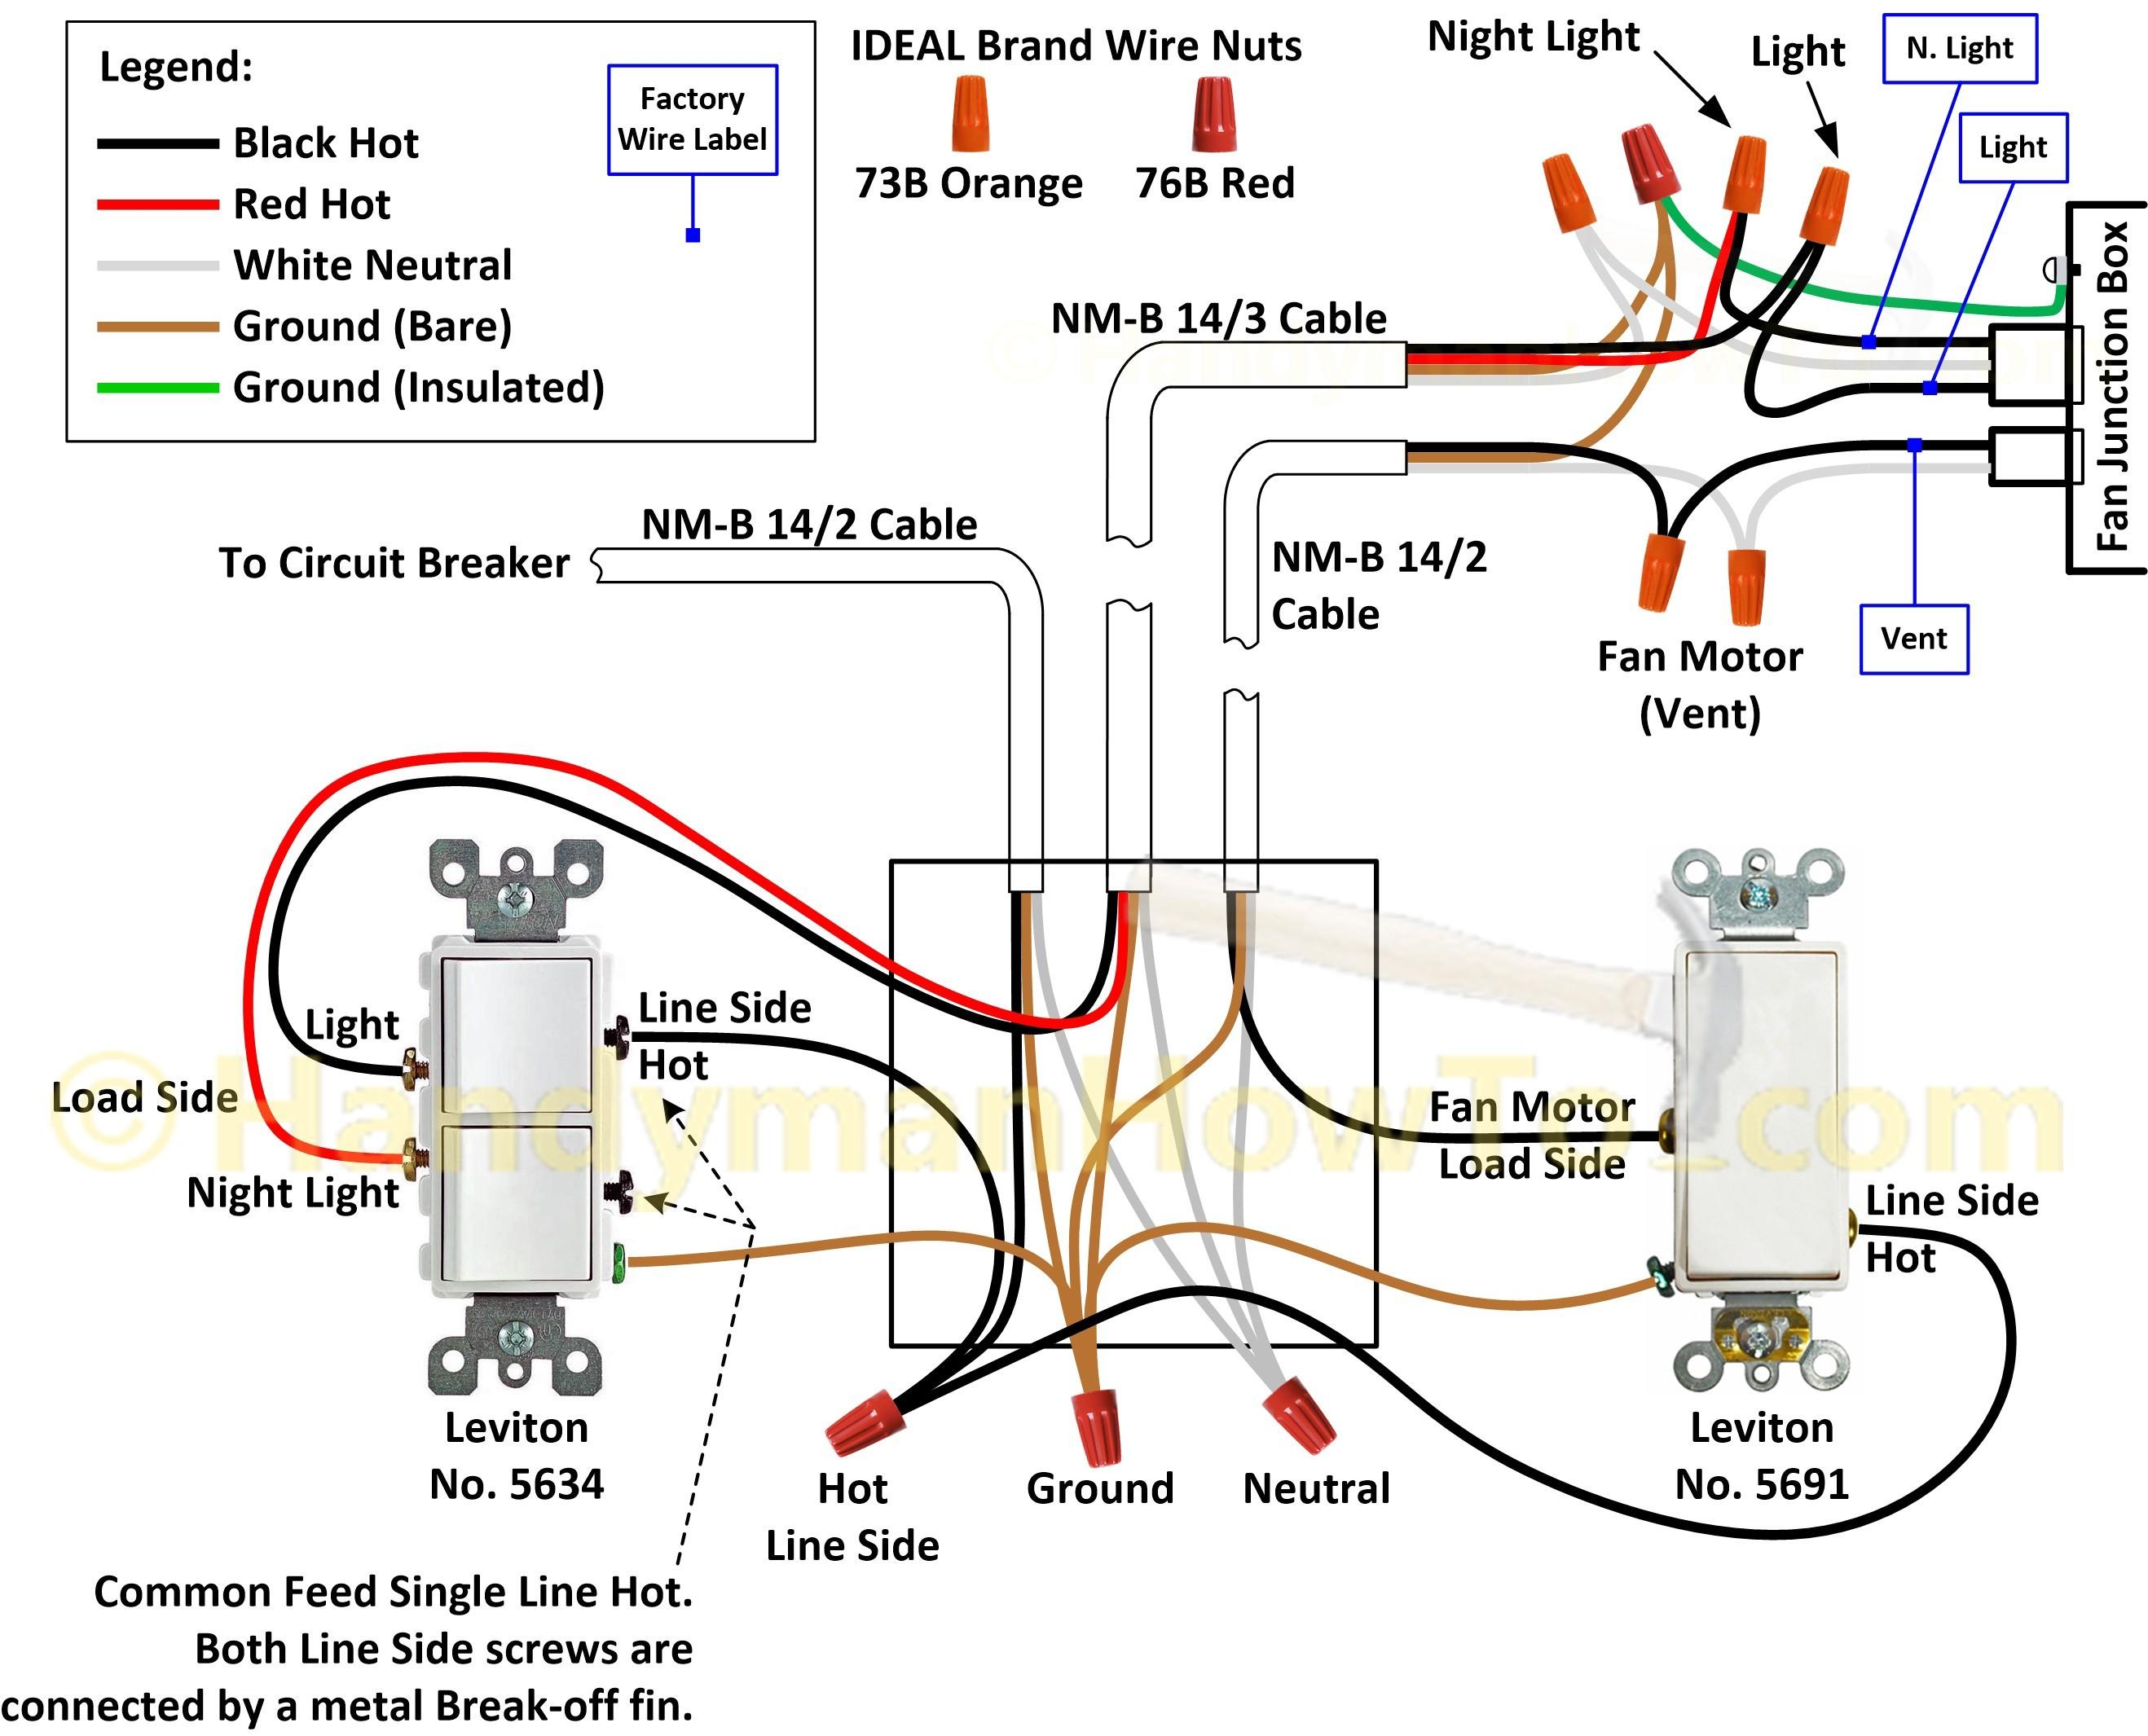 recessed lighting wiring diagram Download How to Wire Recessed Lighting Diagram New How to Wire DOWNLOAD Wiring Diagram